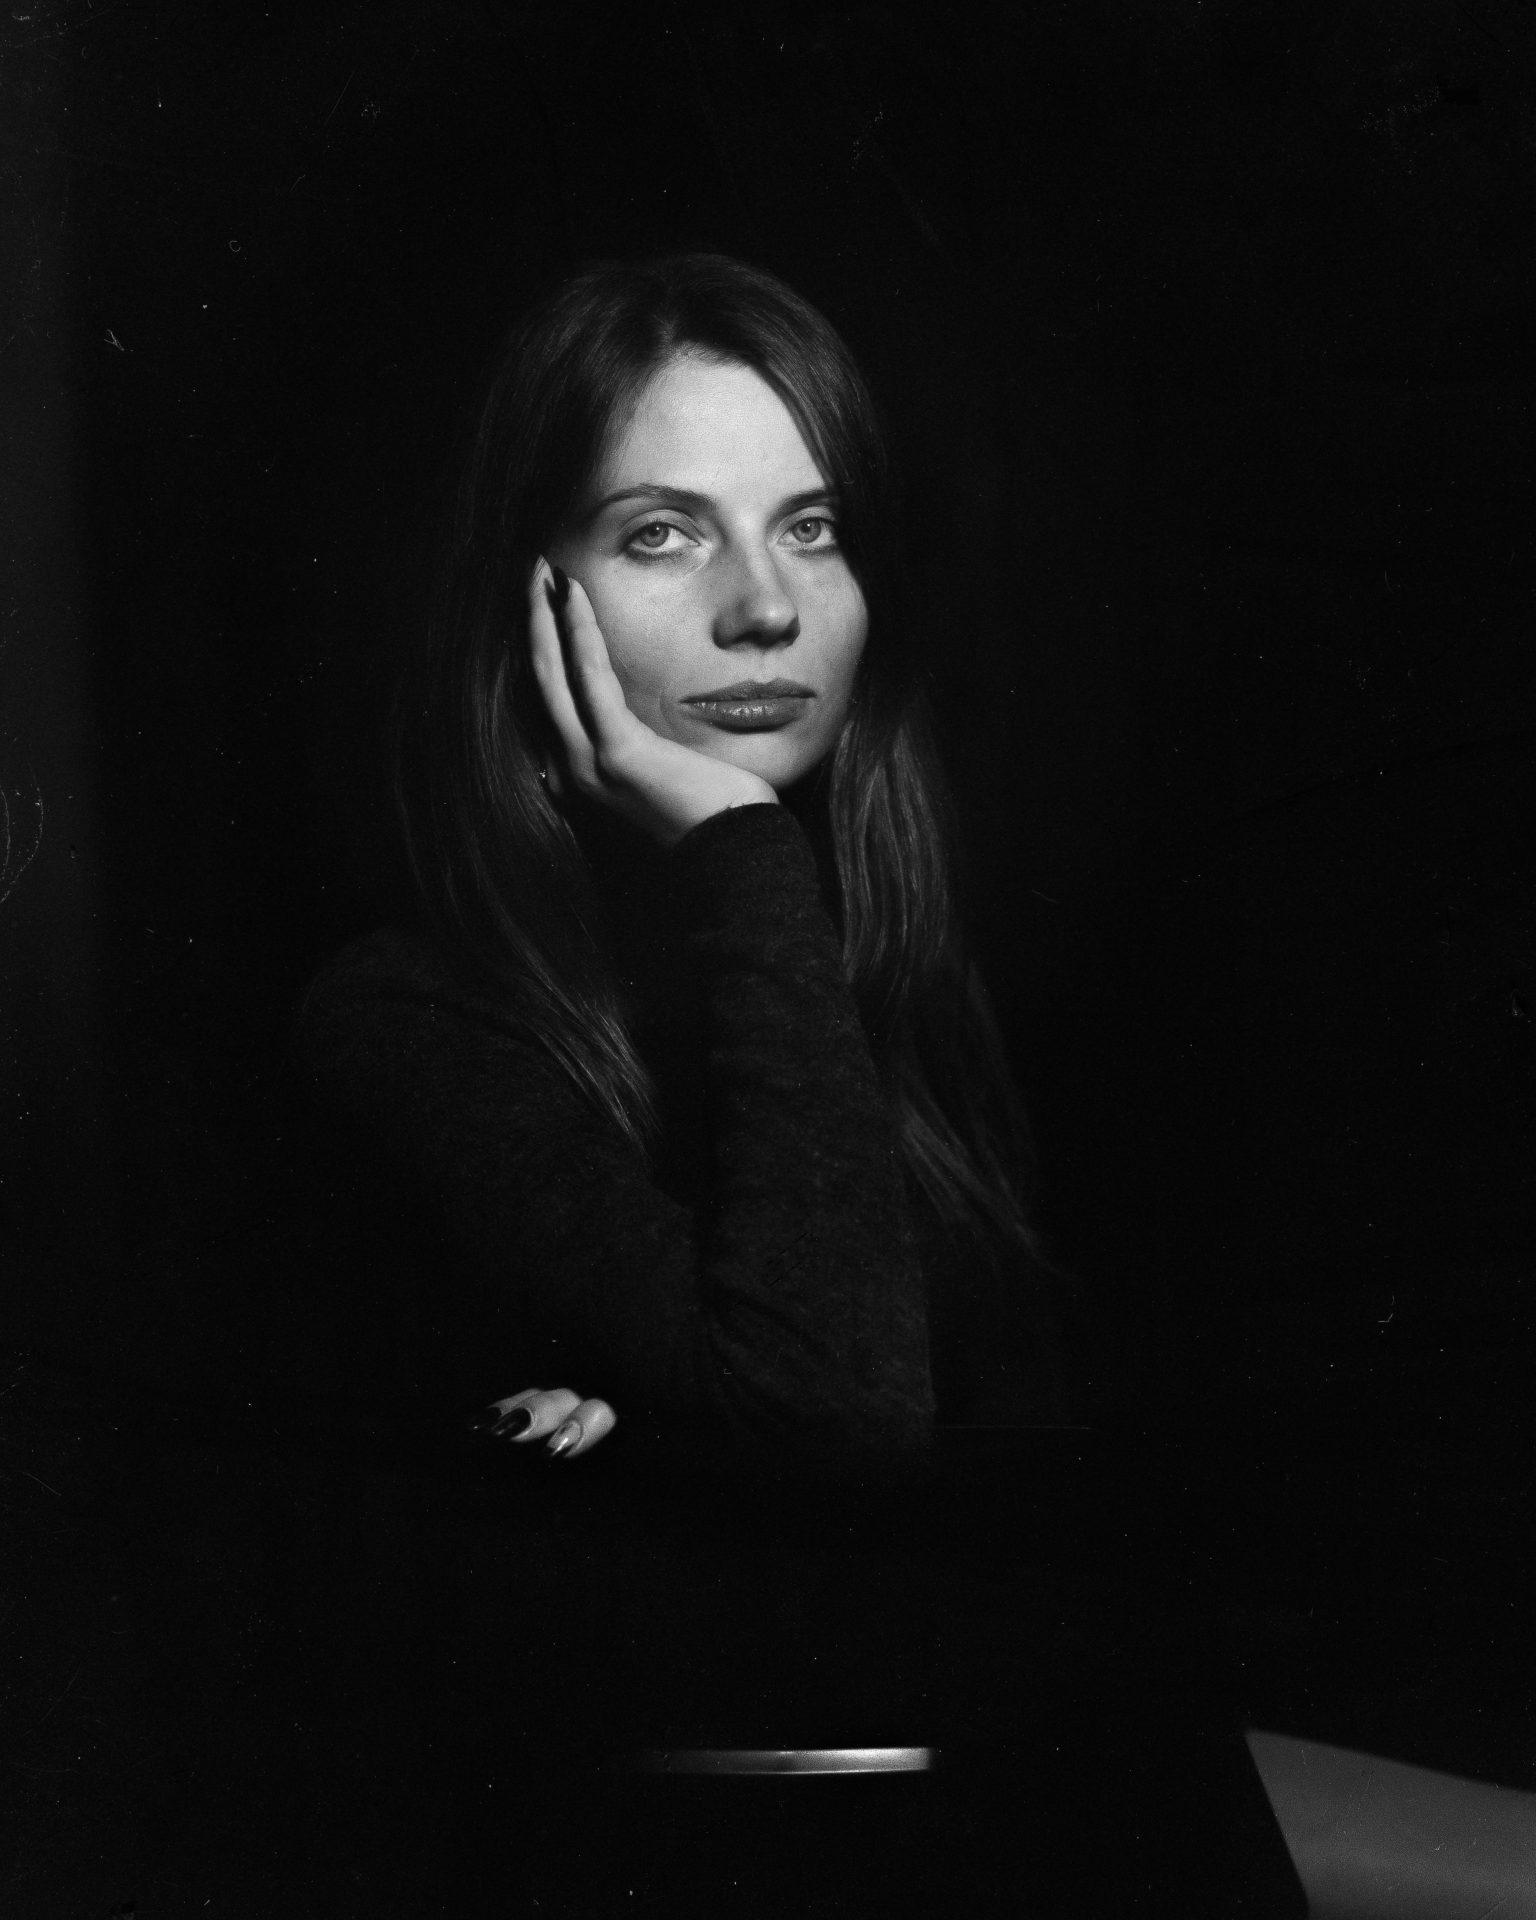 Kristina Steponavičiūtė